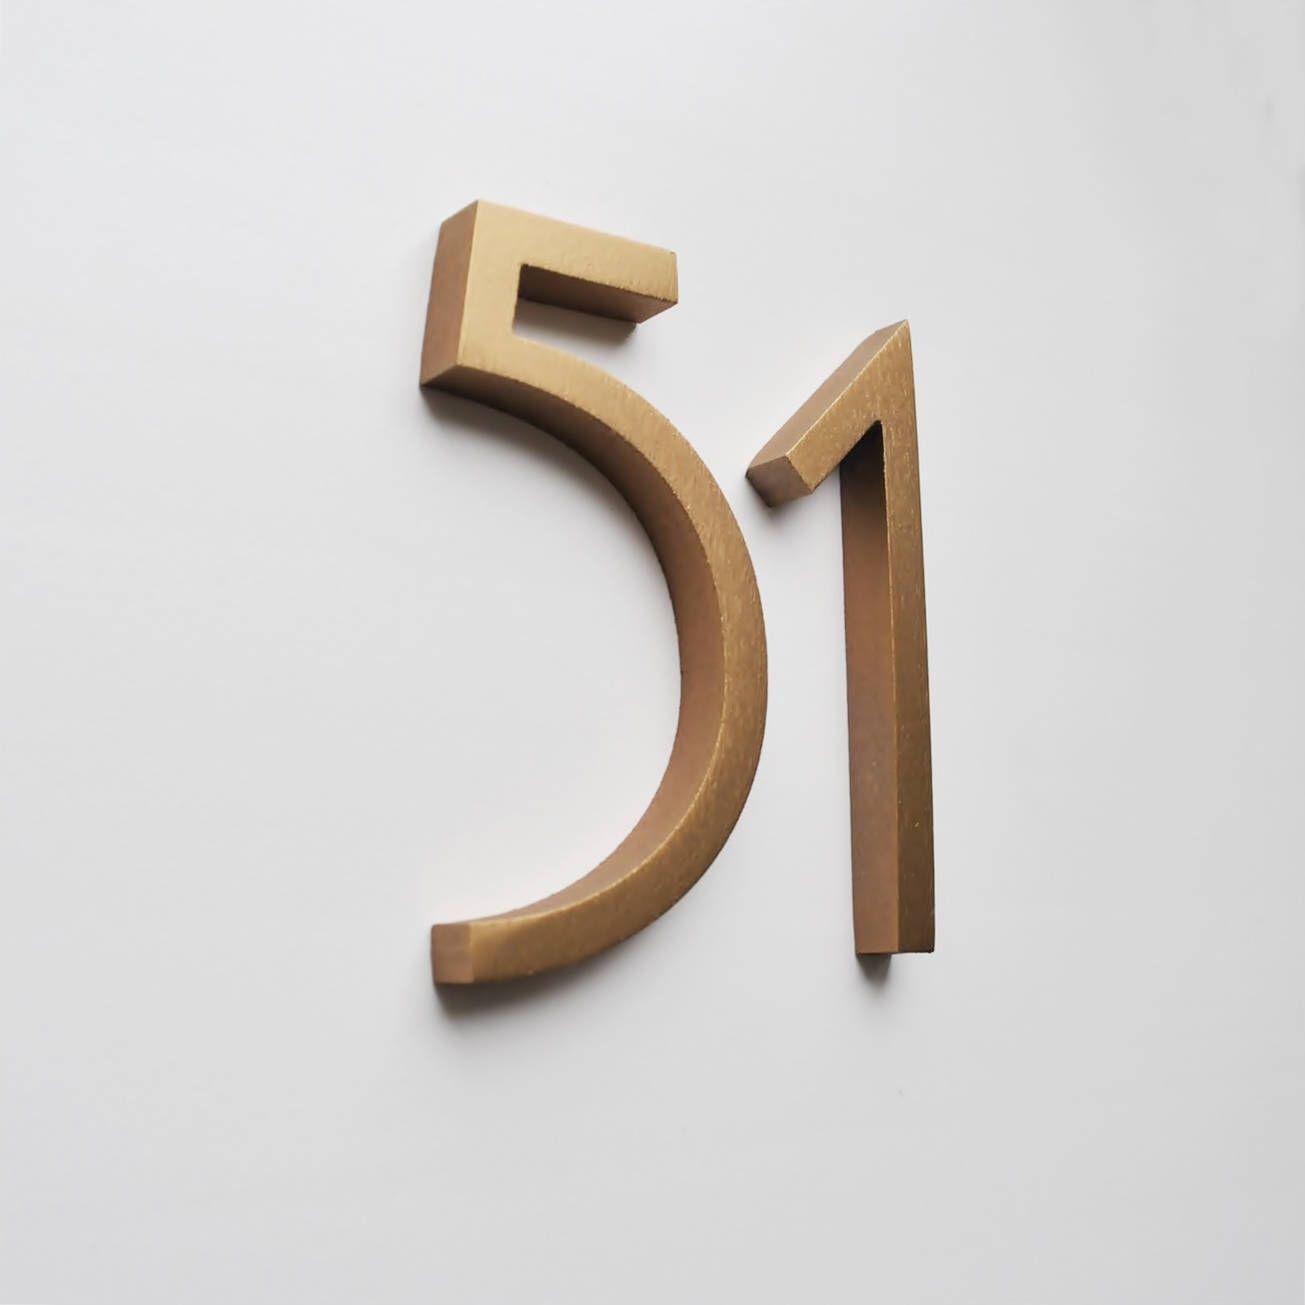 Aluminium Numbers 4inch 10cm Bronze Color Metal House Etsy In 2021 Metal House Numbers Metal Numbers Bronze House